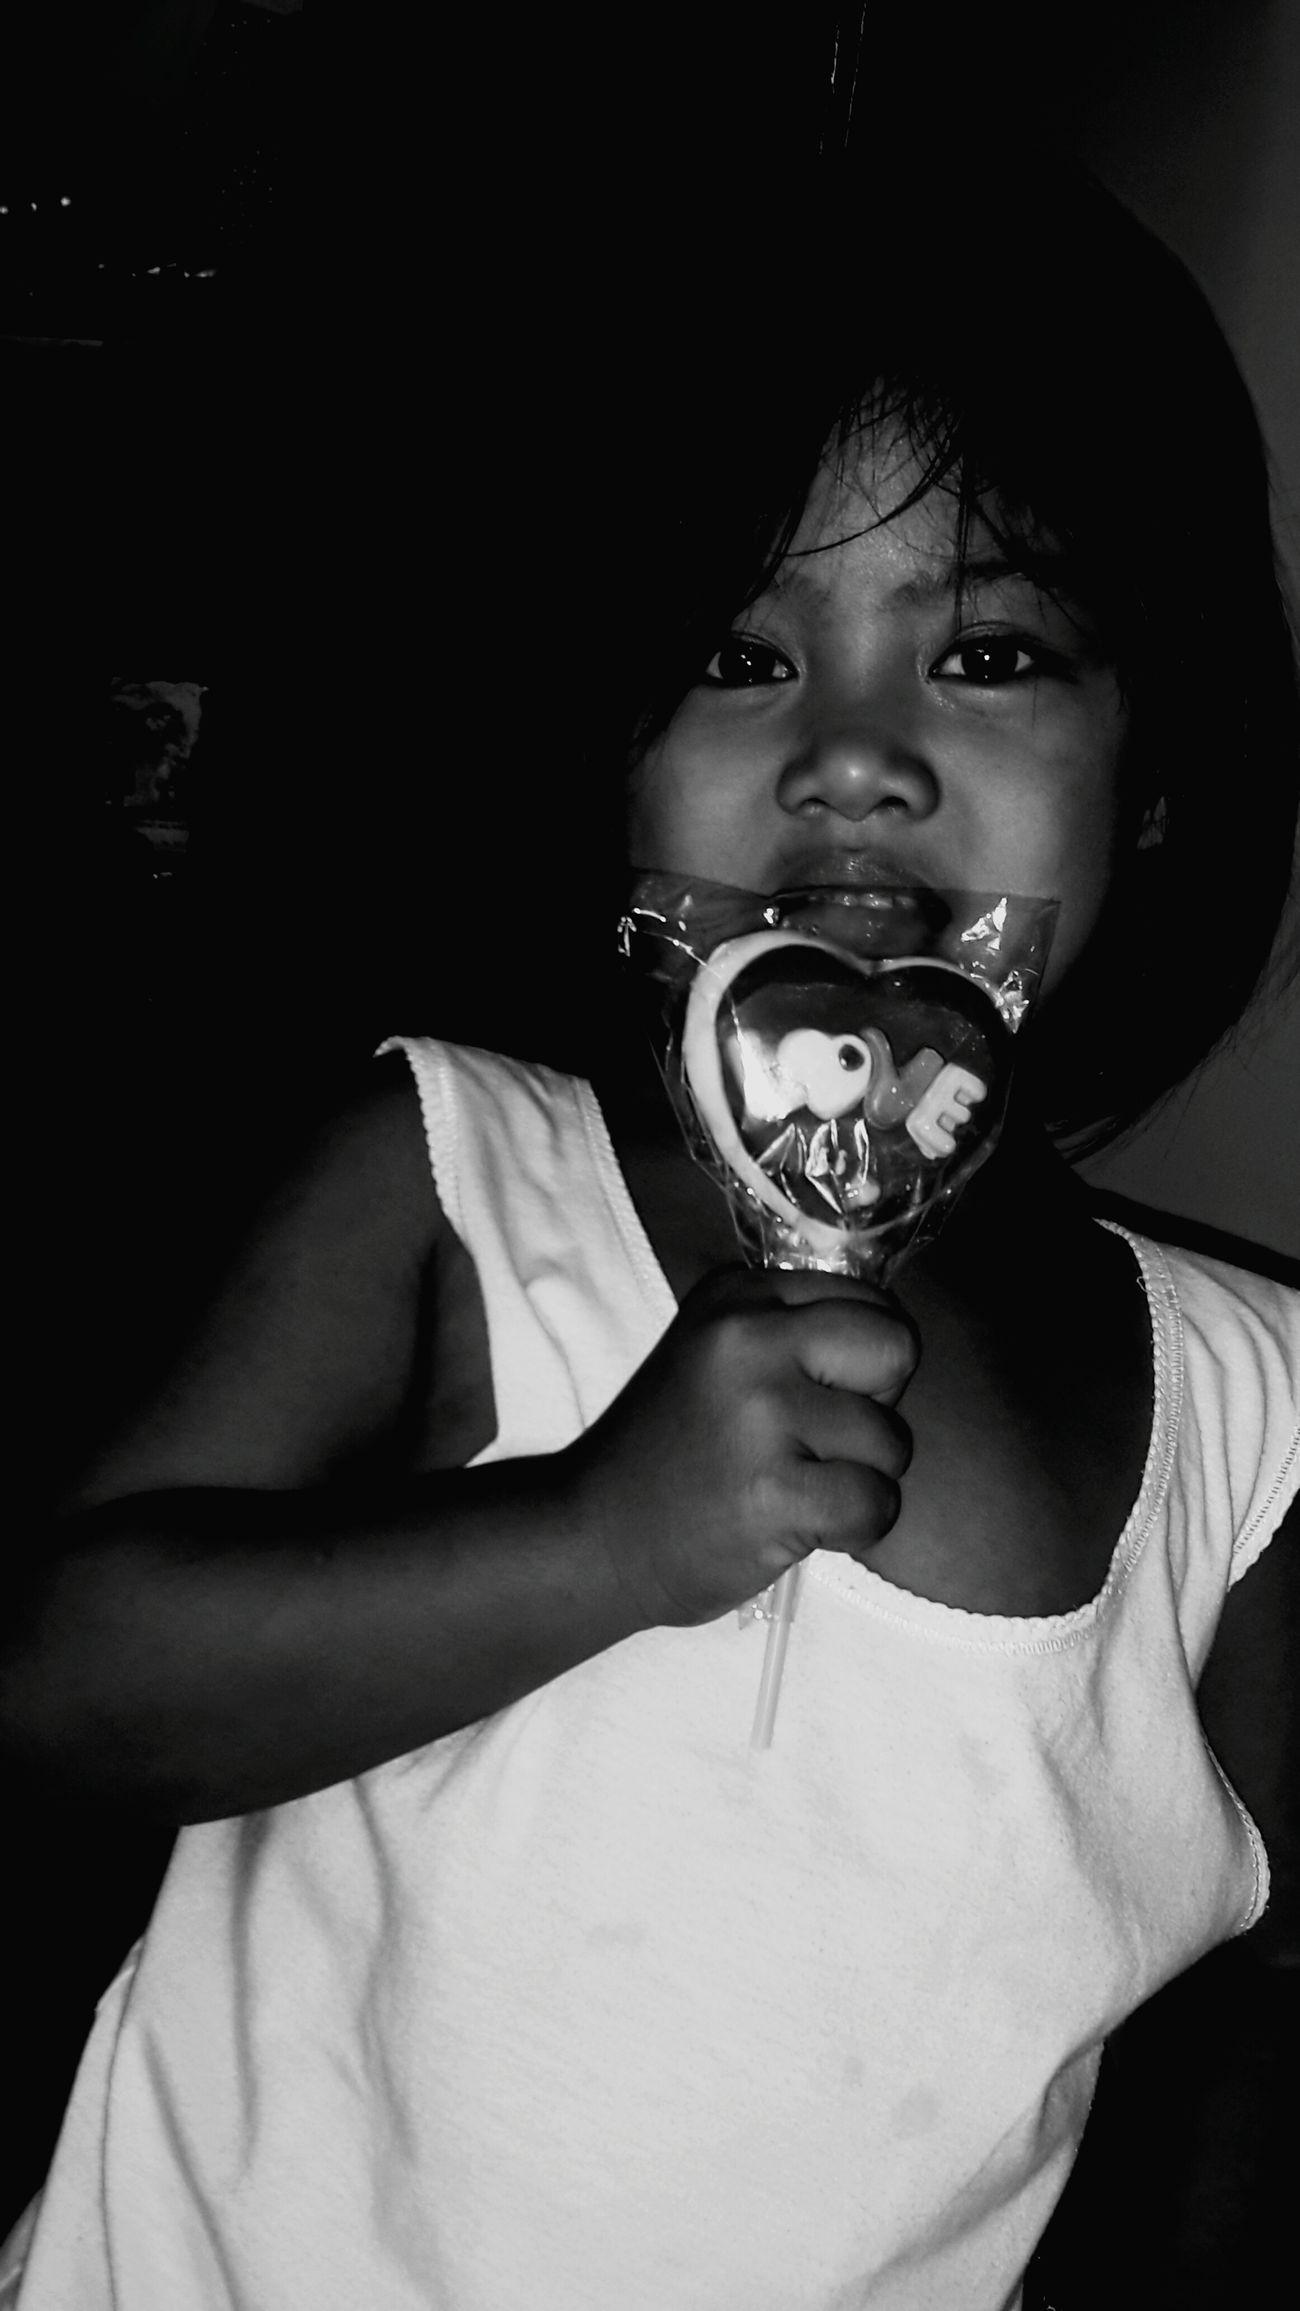 Mondaymorning gift frm. My dearest babii sister.. ate lavs u so much babii Hello World First Eyeem Photo